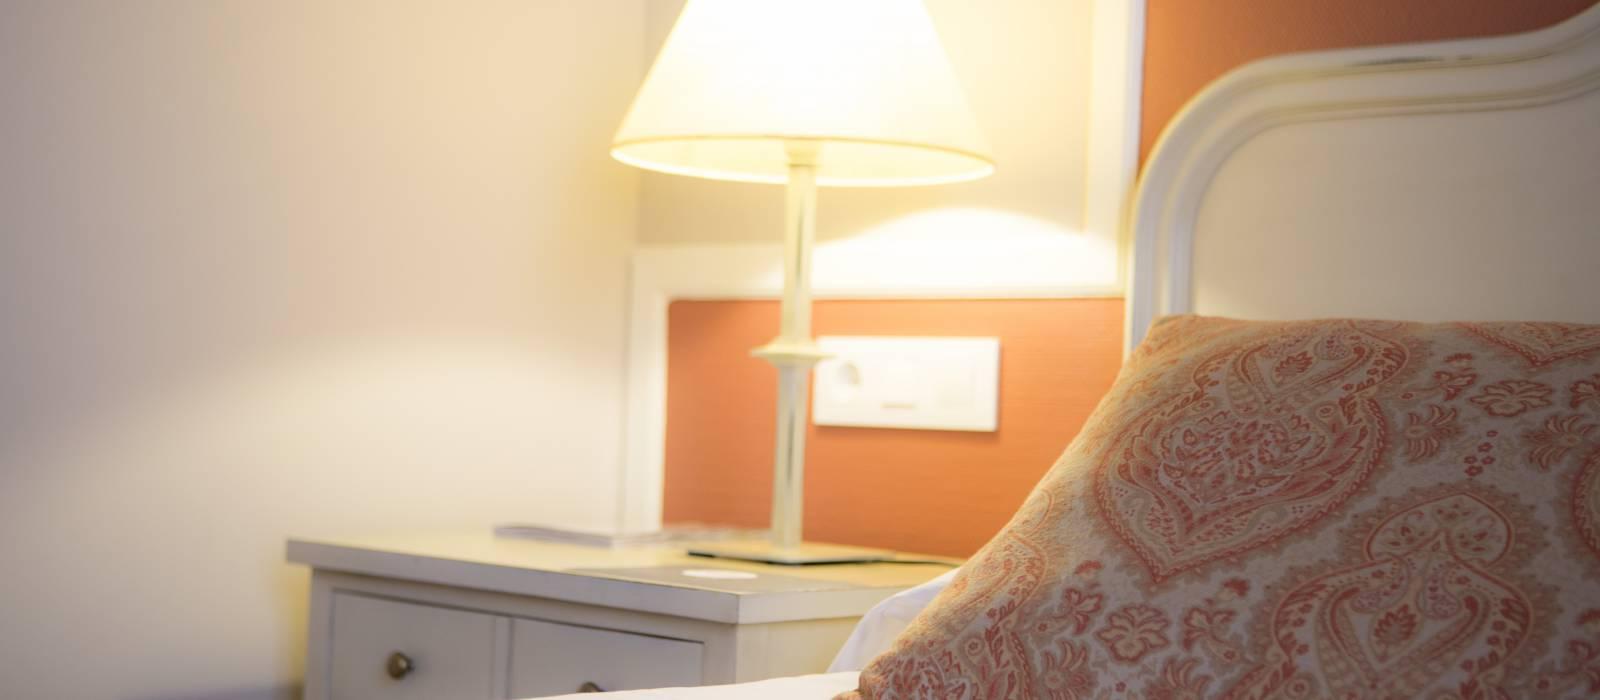 Rooms Hotel Sevilla La Rábida - Vincci Hotels - Suite Room